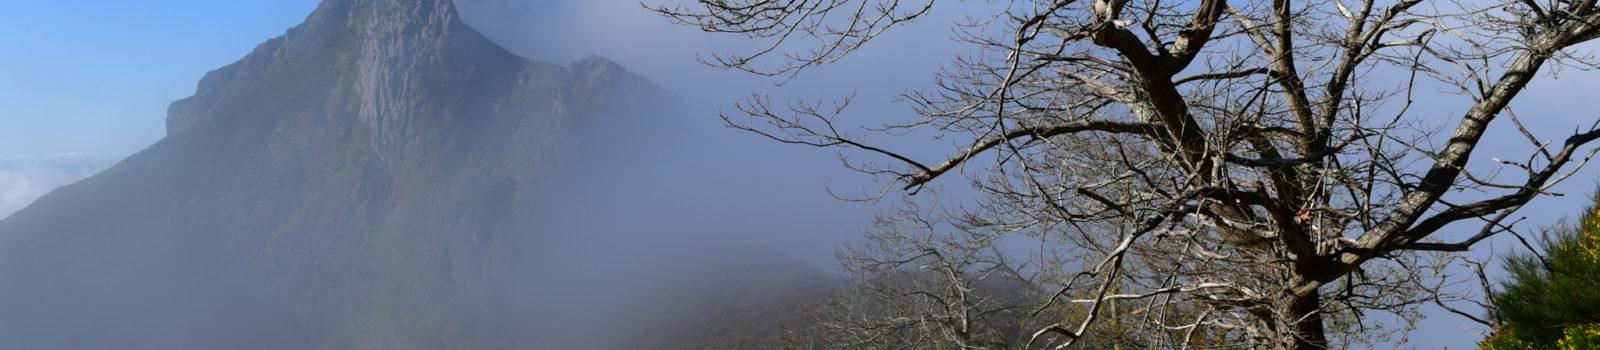 Besteigung Pico Grande im zentralen Bergland (Tag 11)